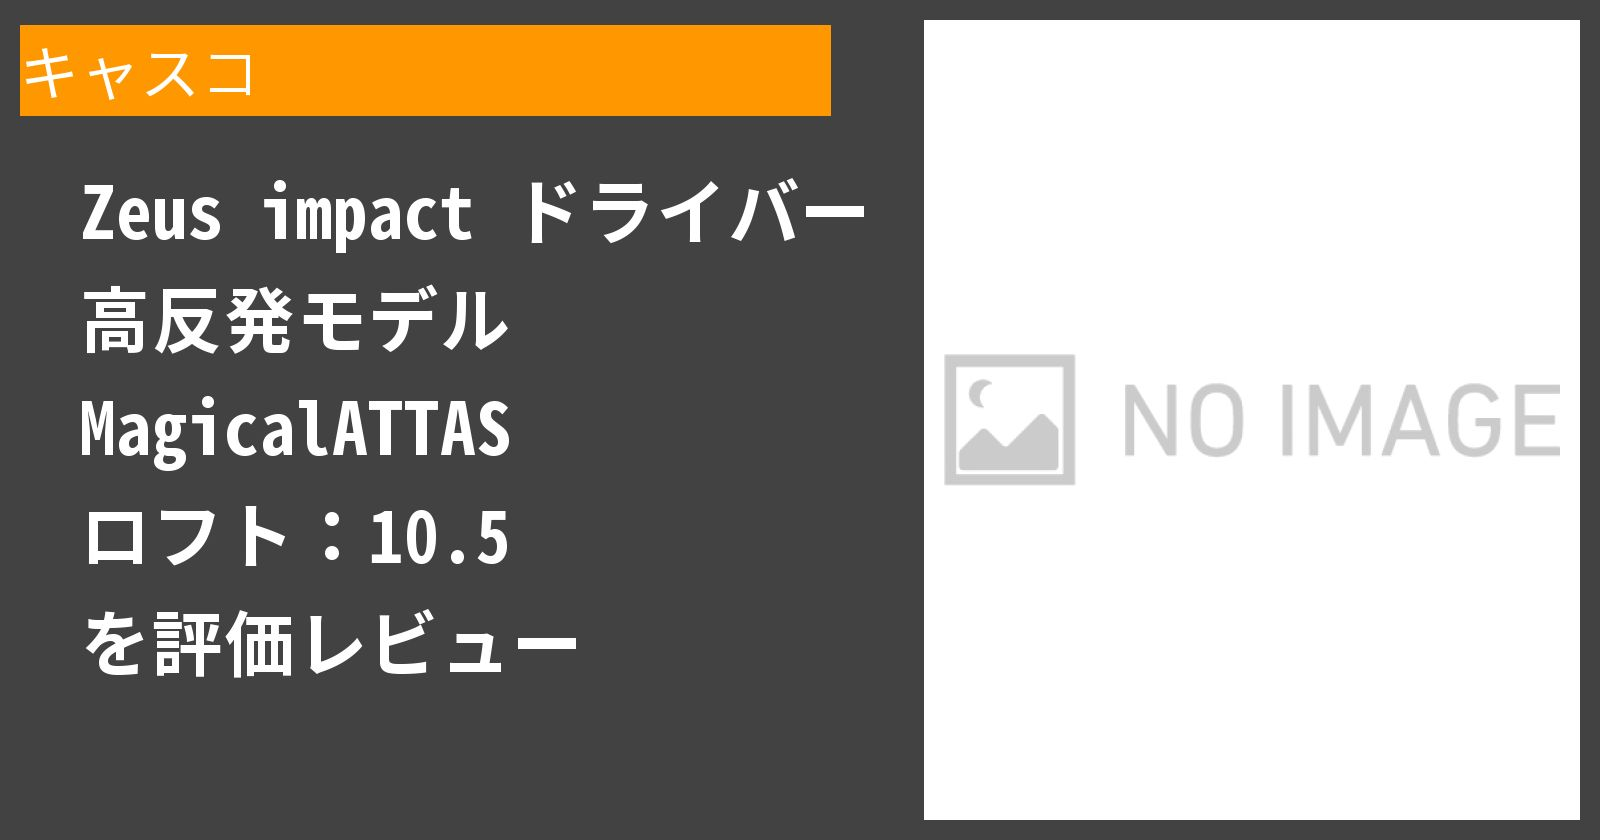 Zeus impact ドライバー 高反発モデル MagicalATTAS ロフト:10.5を徹底評価